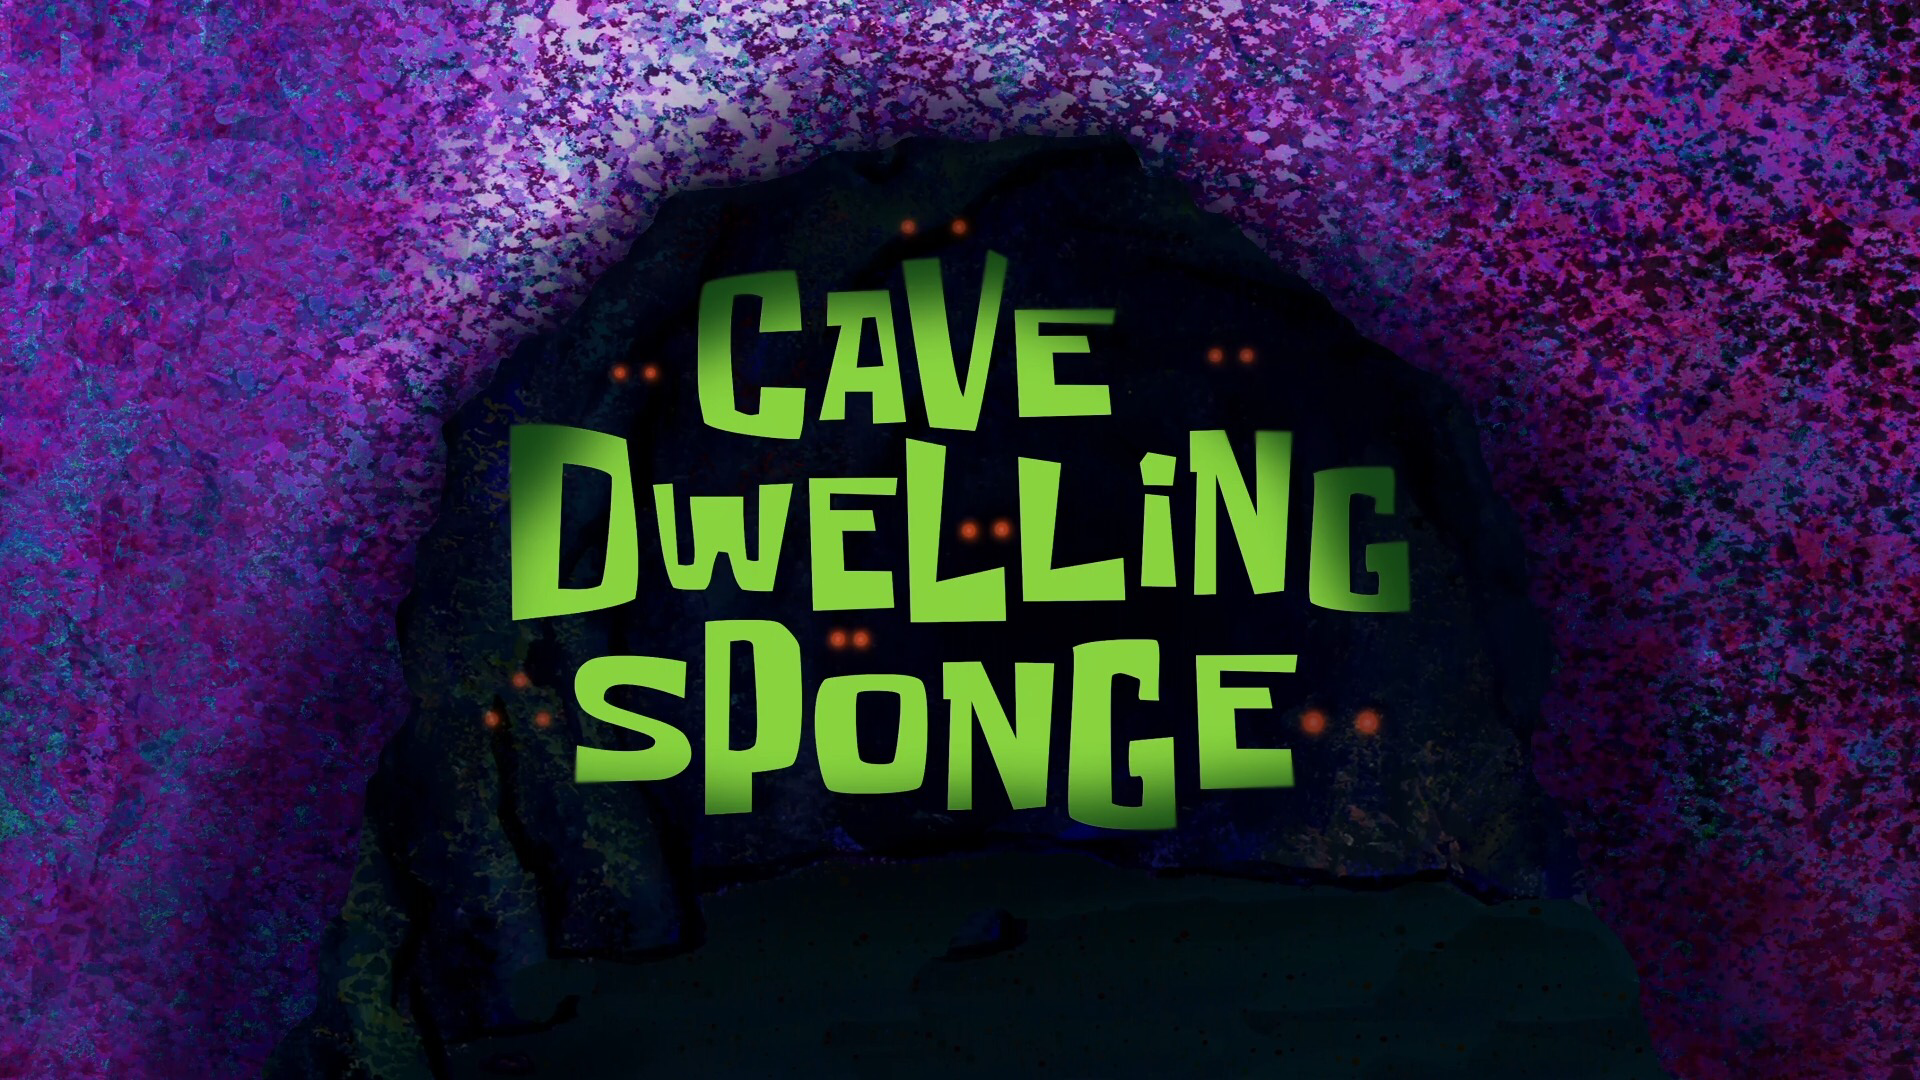 Cave Dwelling Sponge